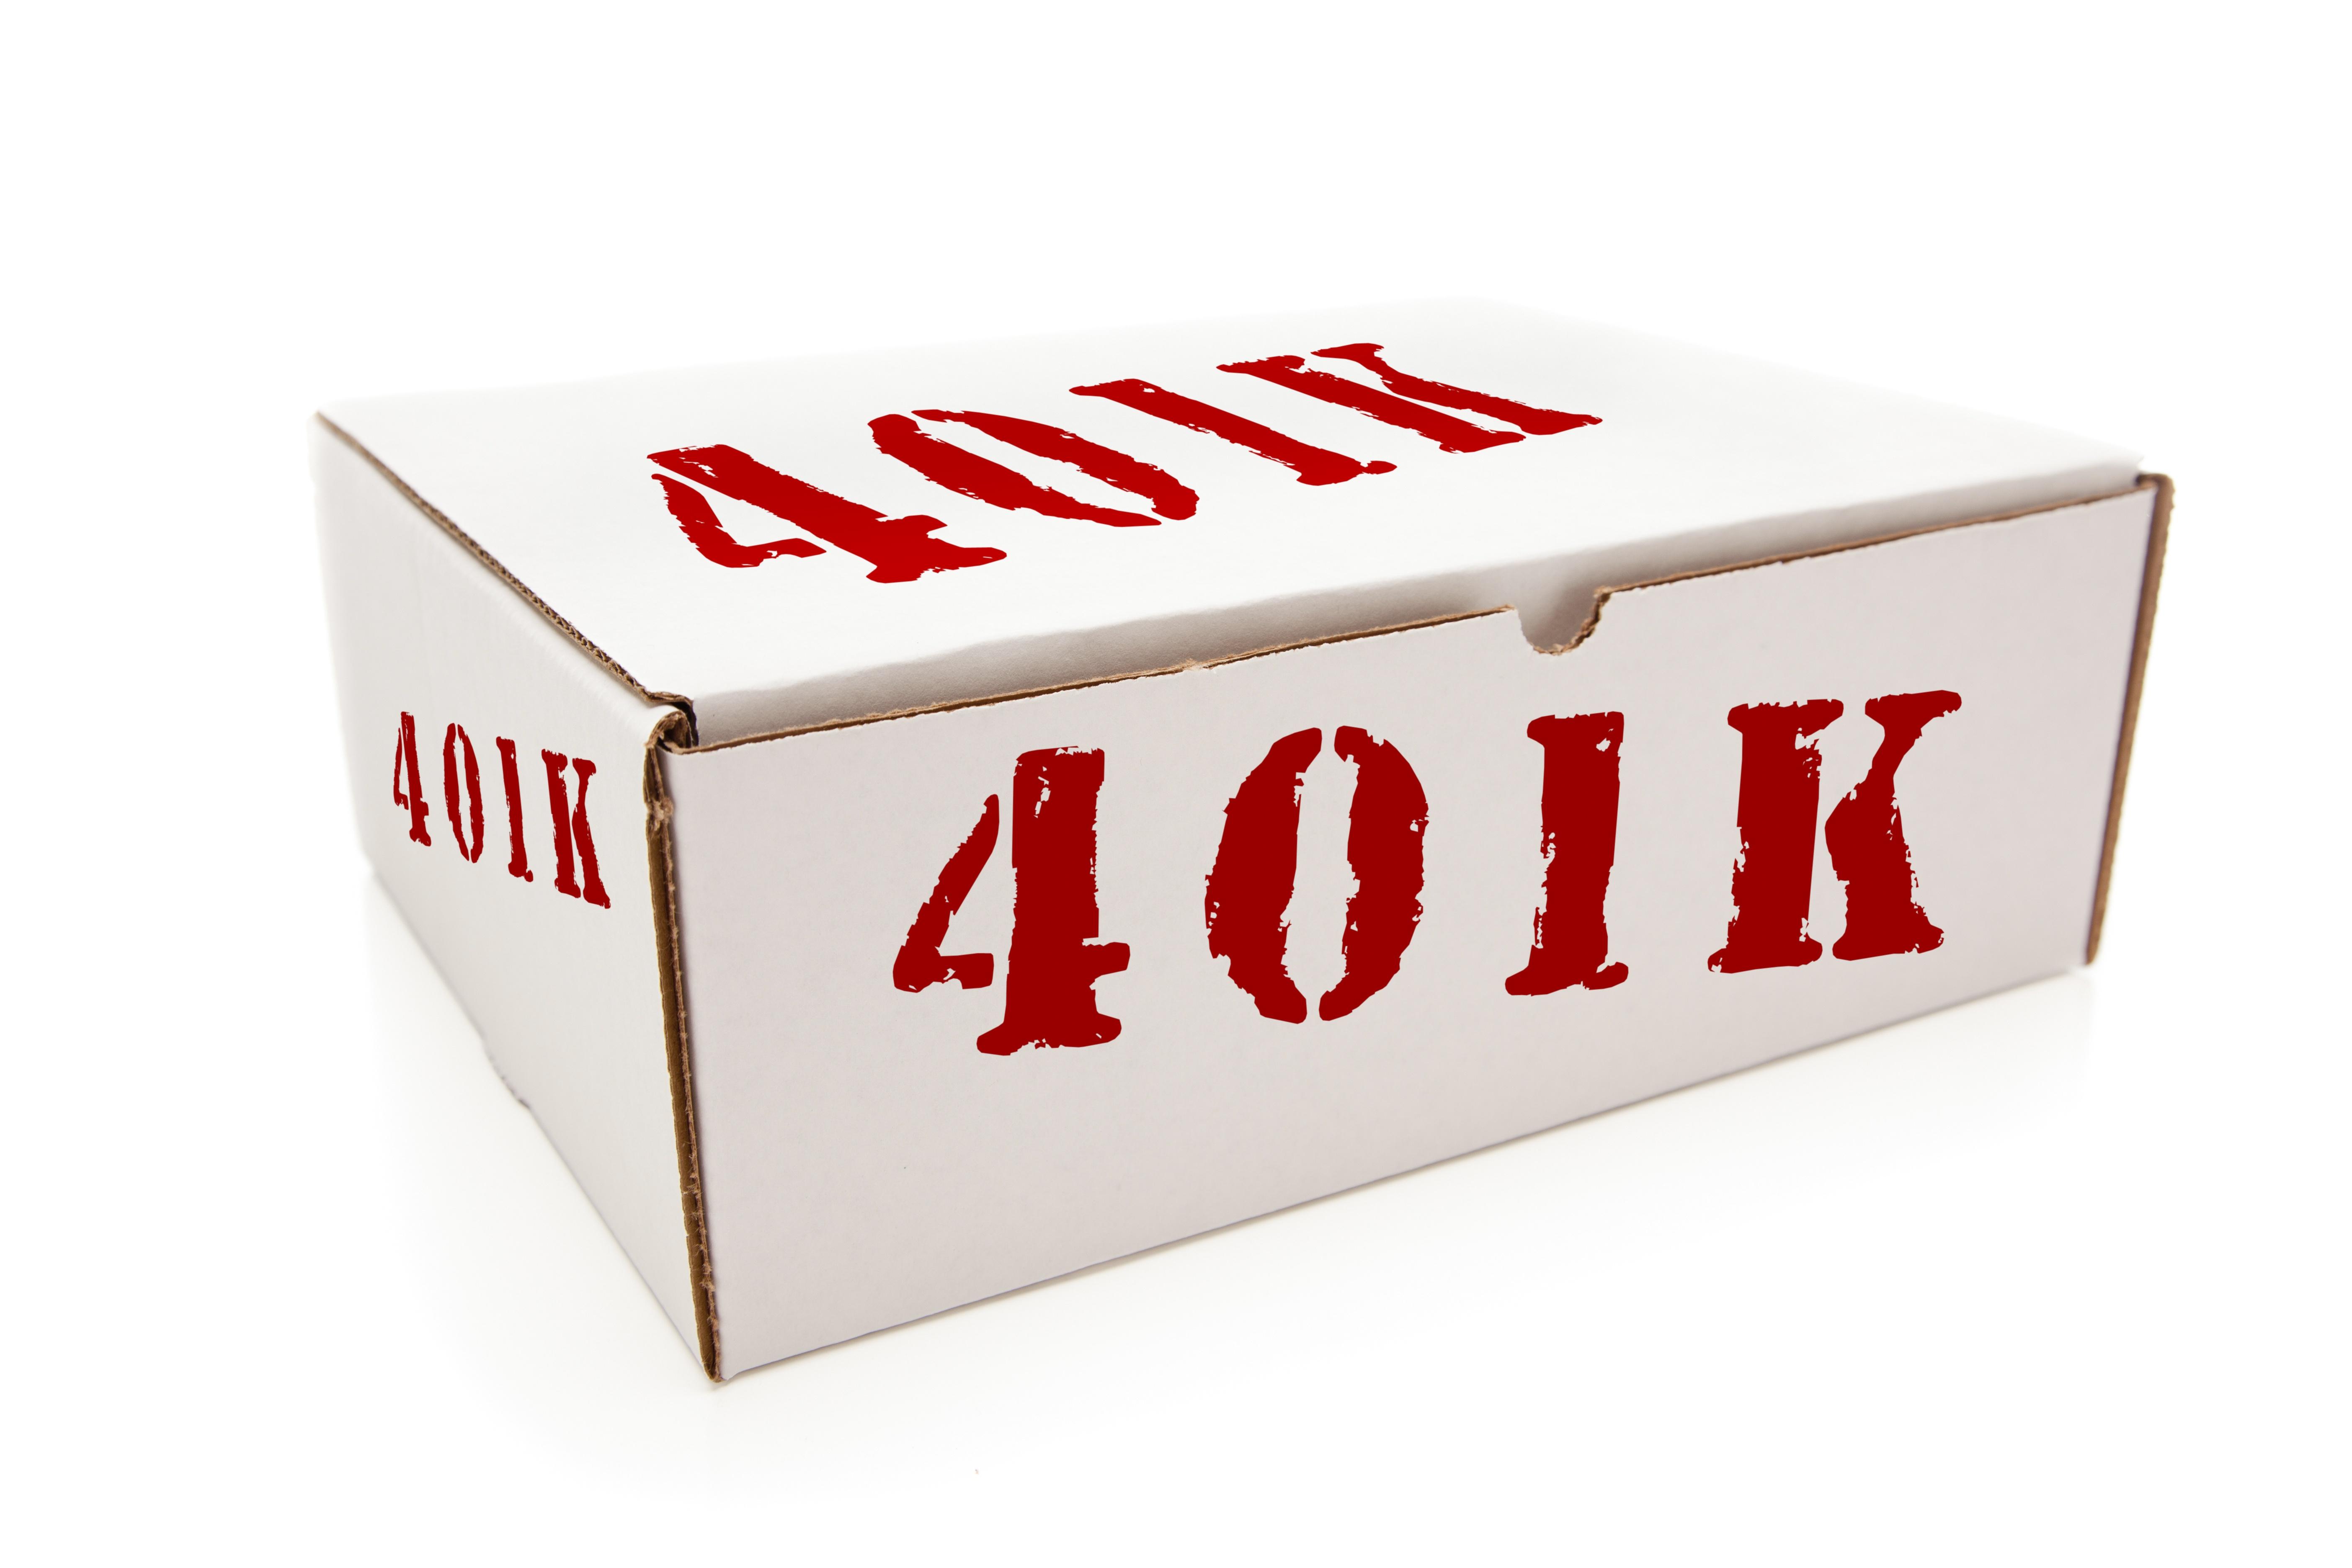 White box stamped 401(k)